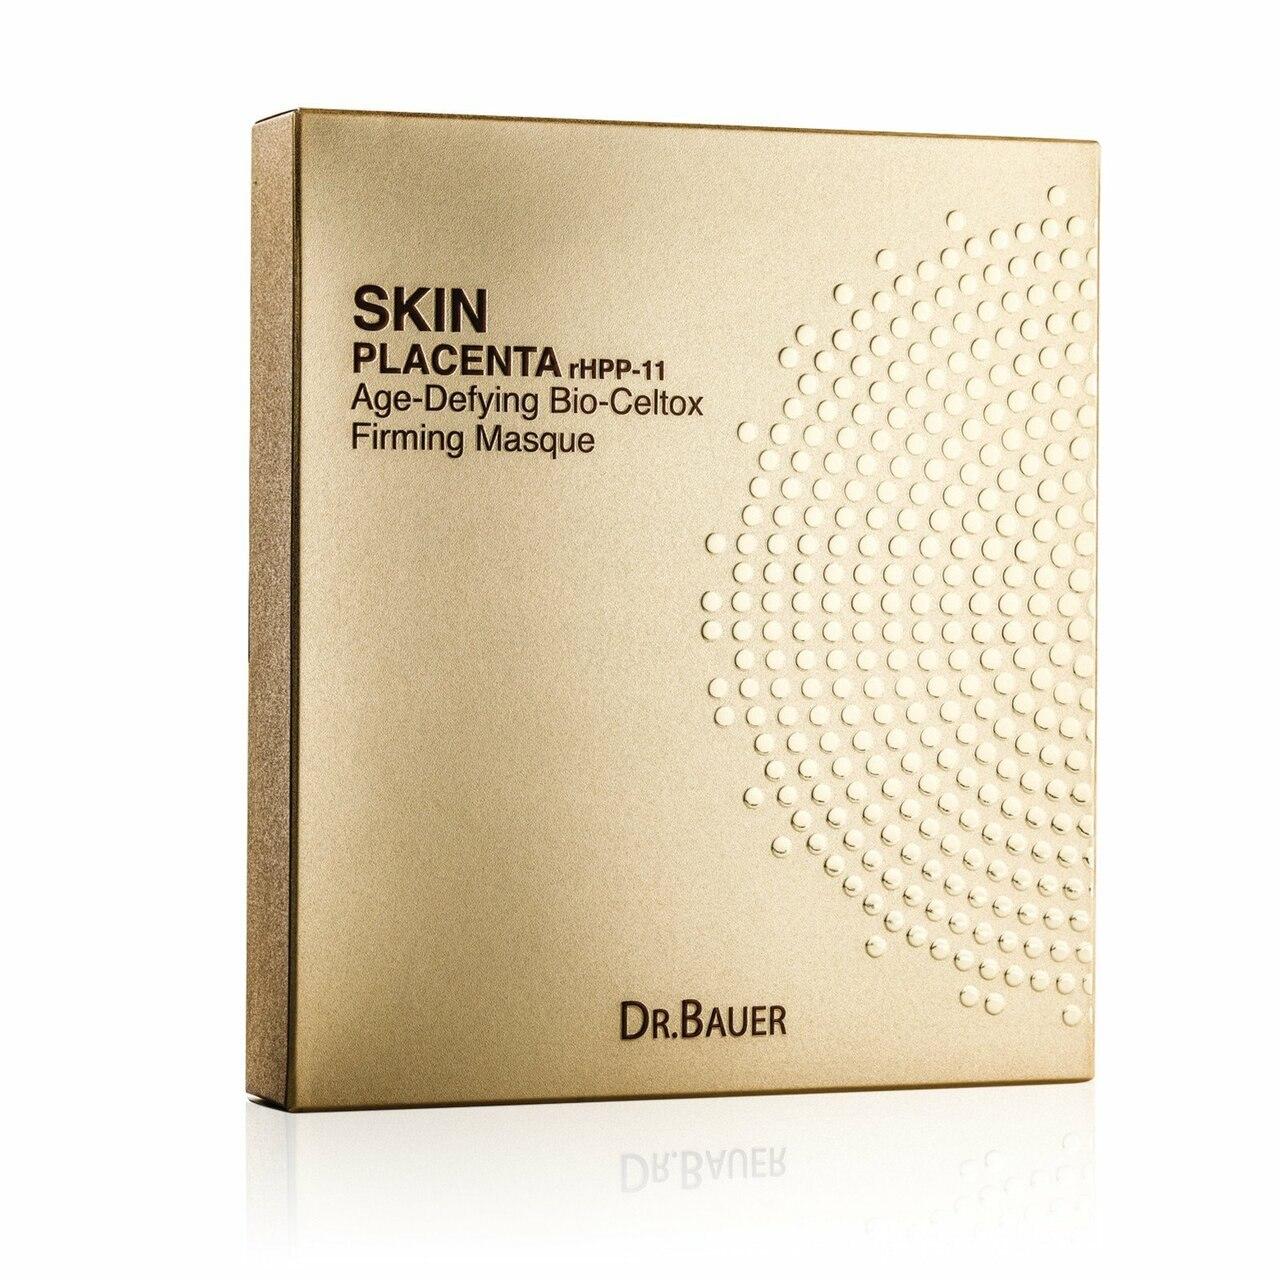 Dr. Bauer Age-Defying Bio-Celtox Firming Masque